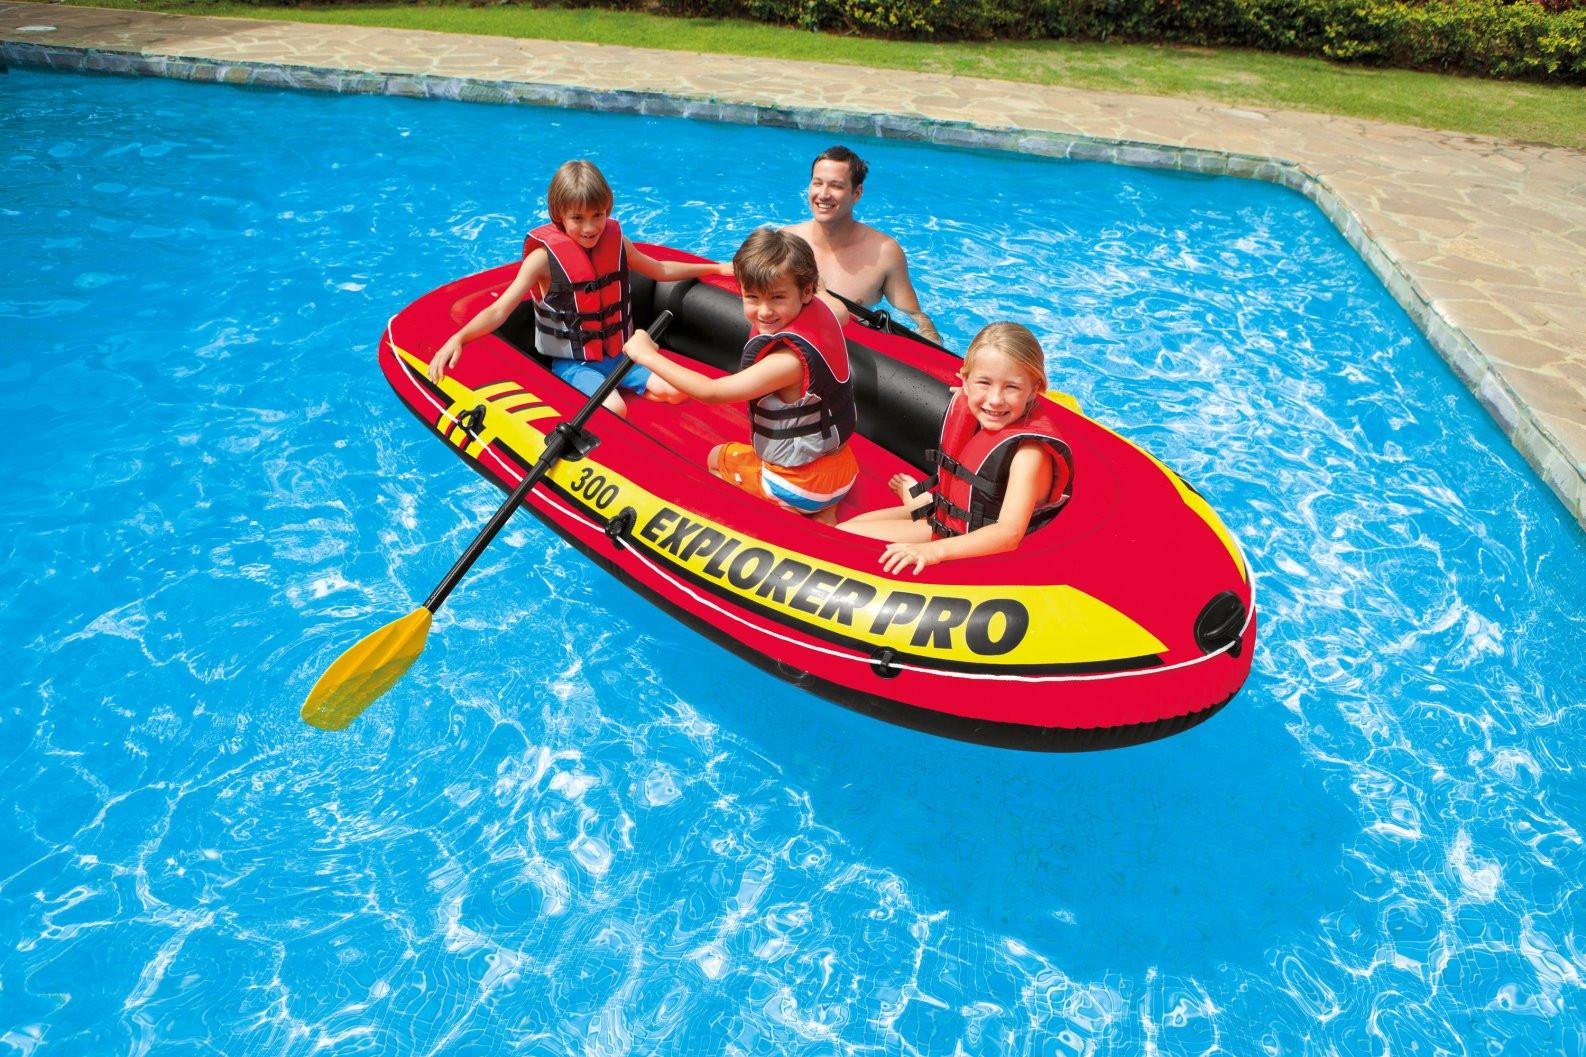 лодка intex explorer 300 с веслами